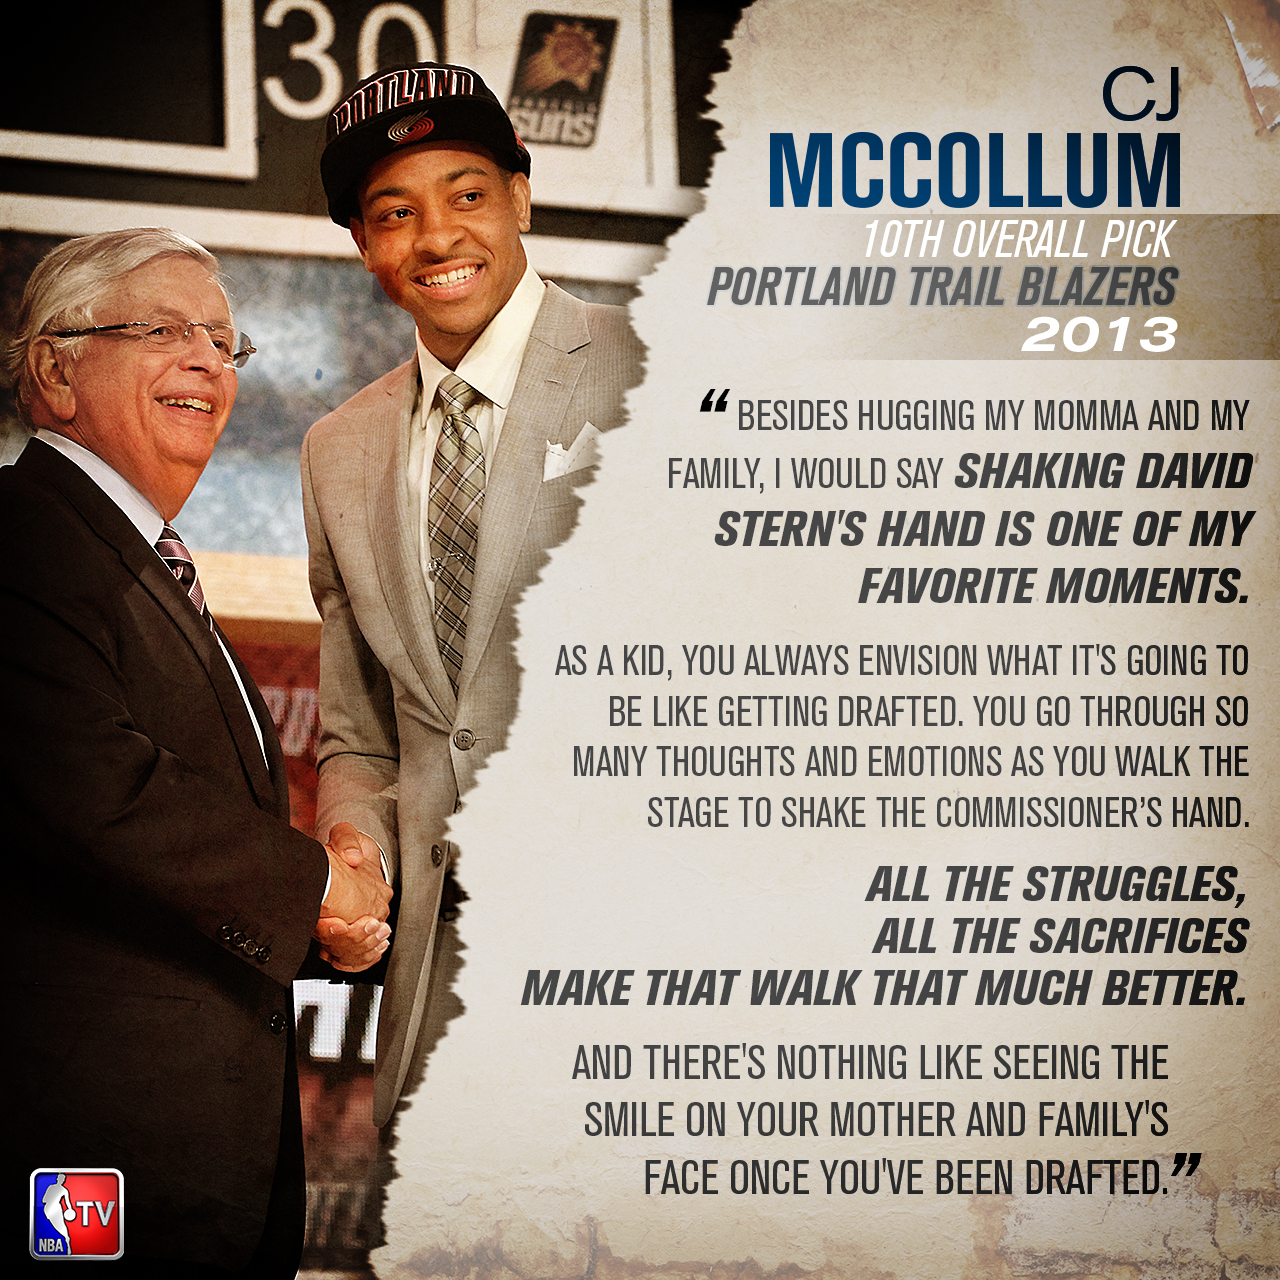 CJ McCollum - #DraftMemory